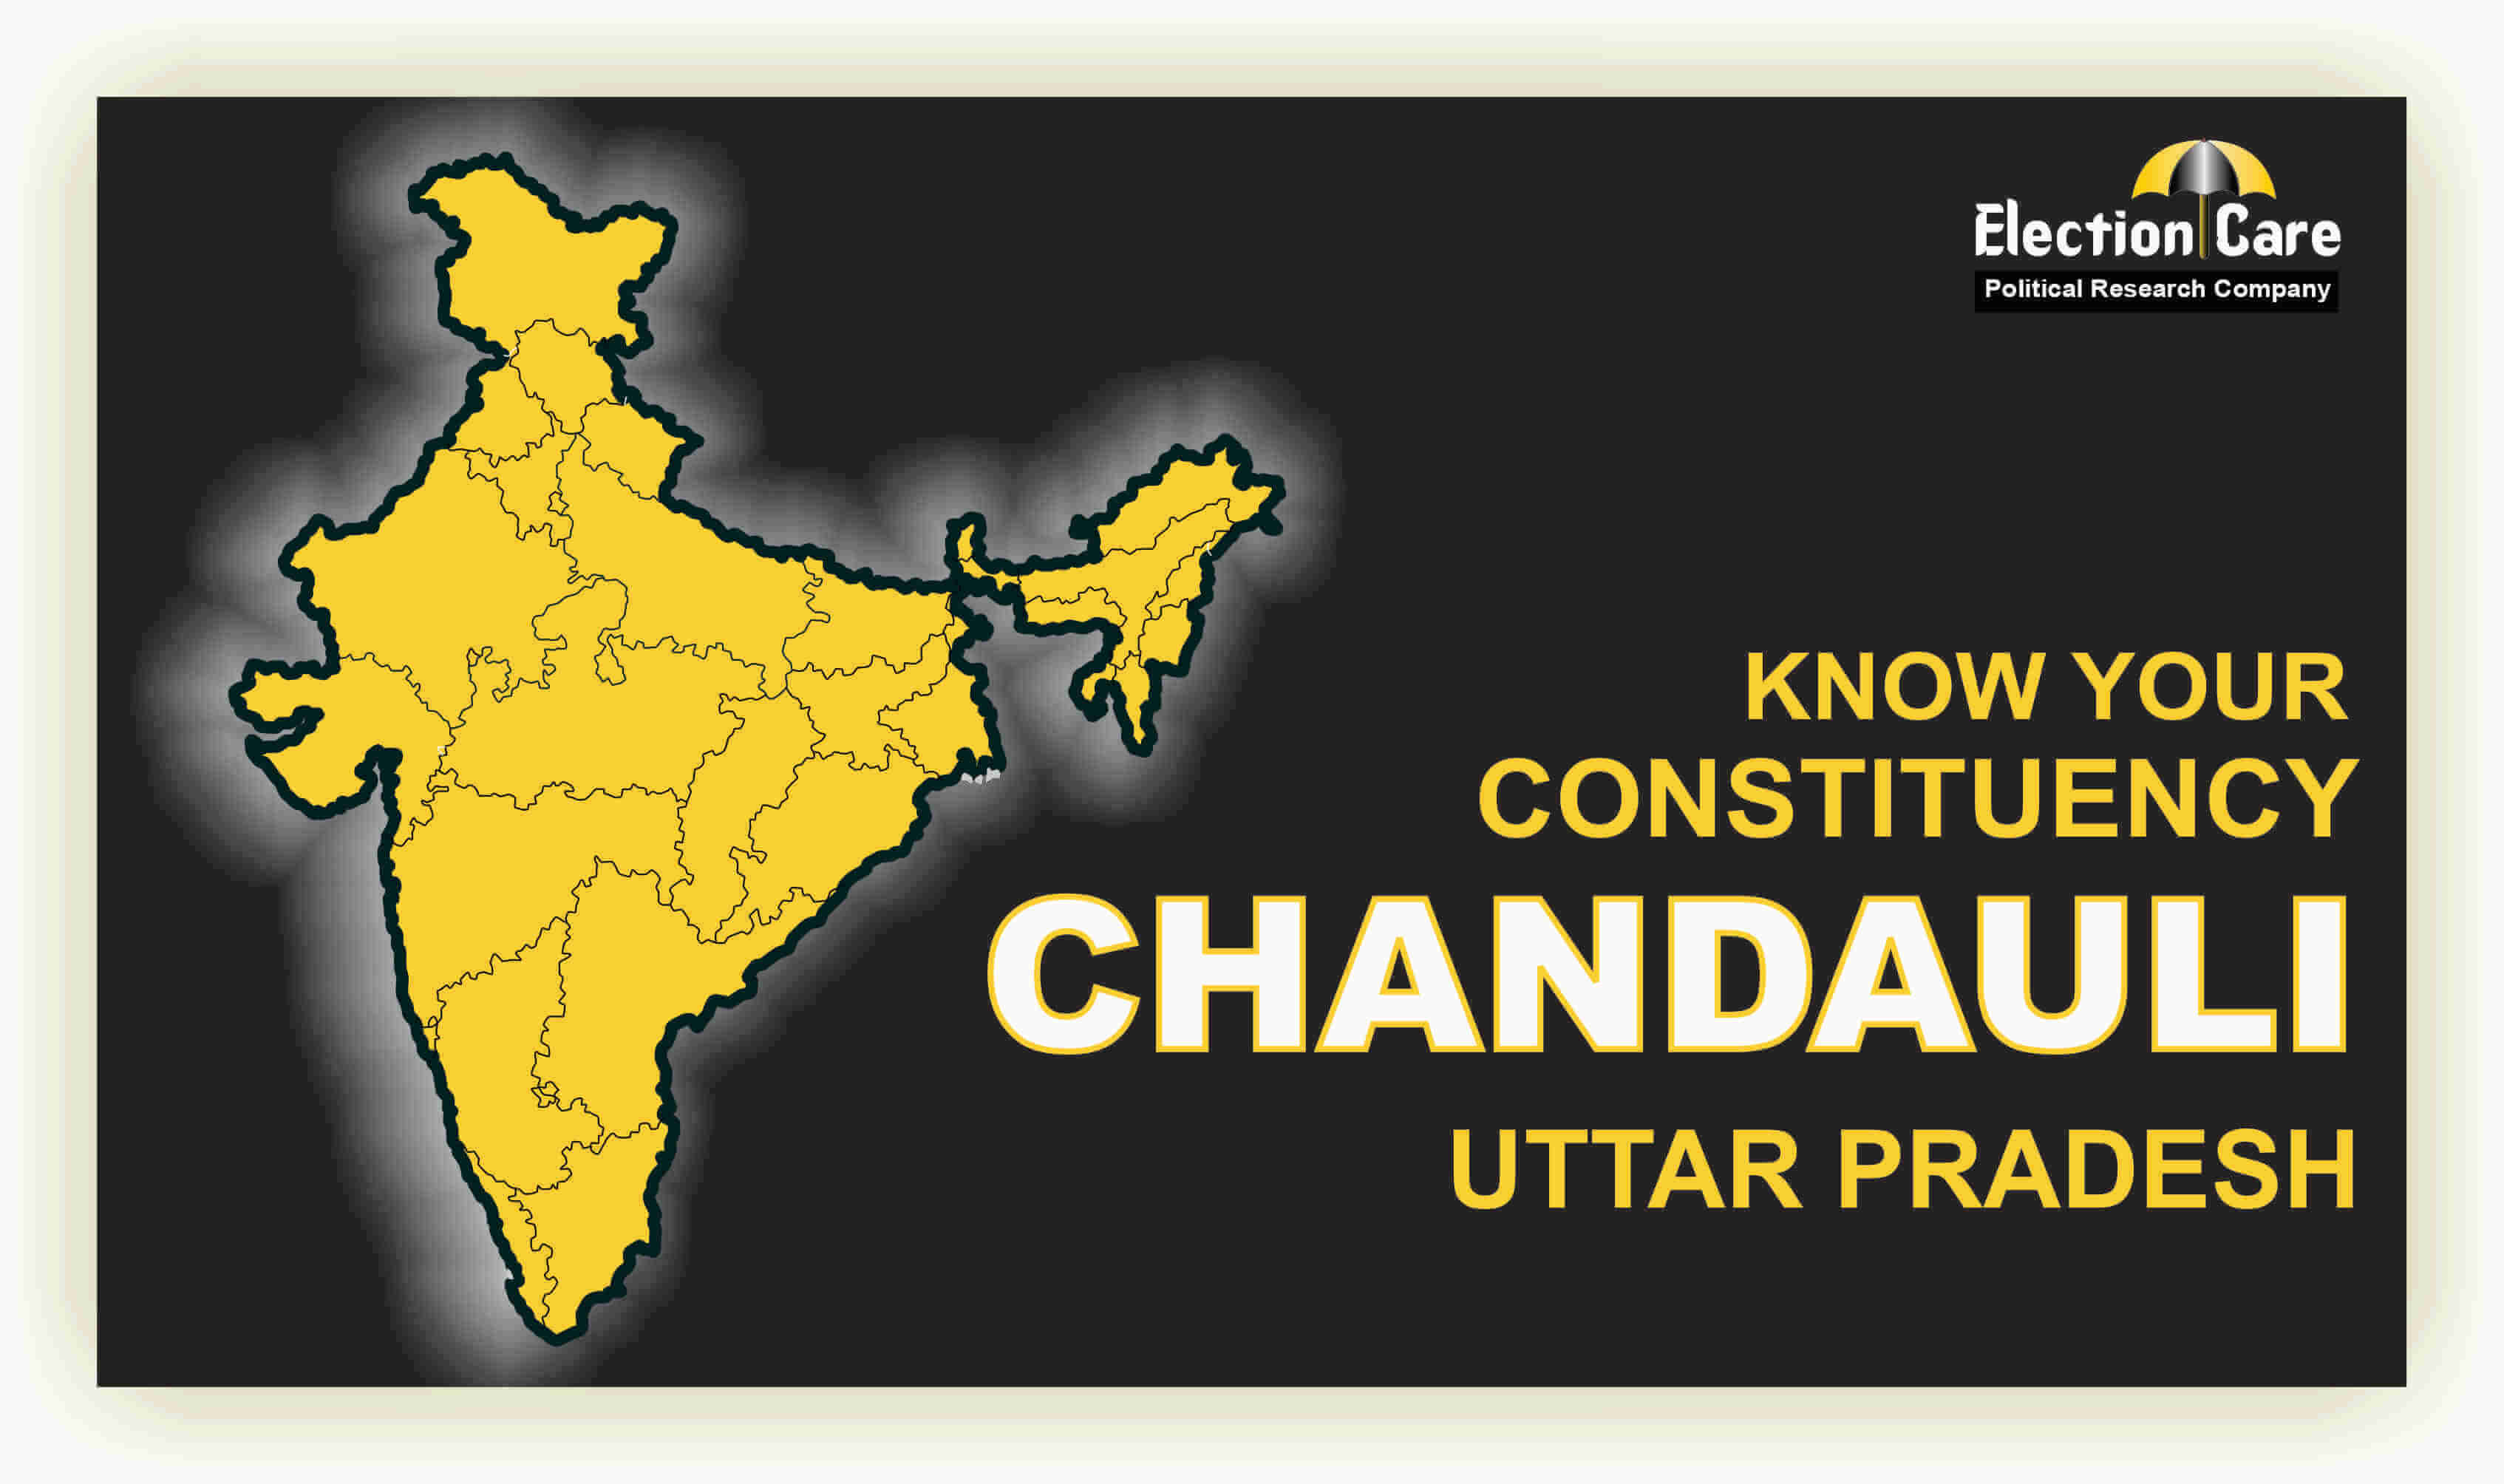 Chandauli Parliament Election Result